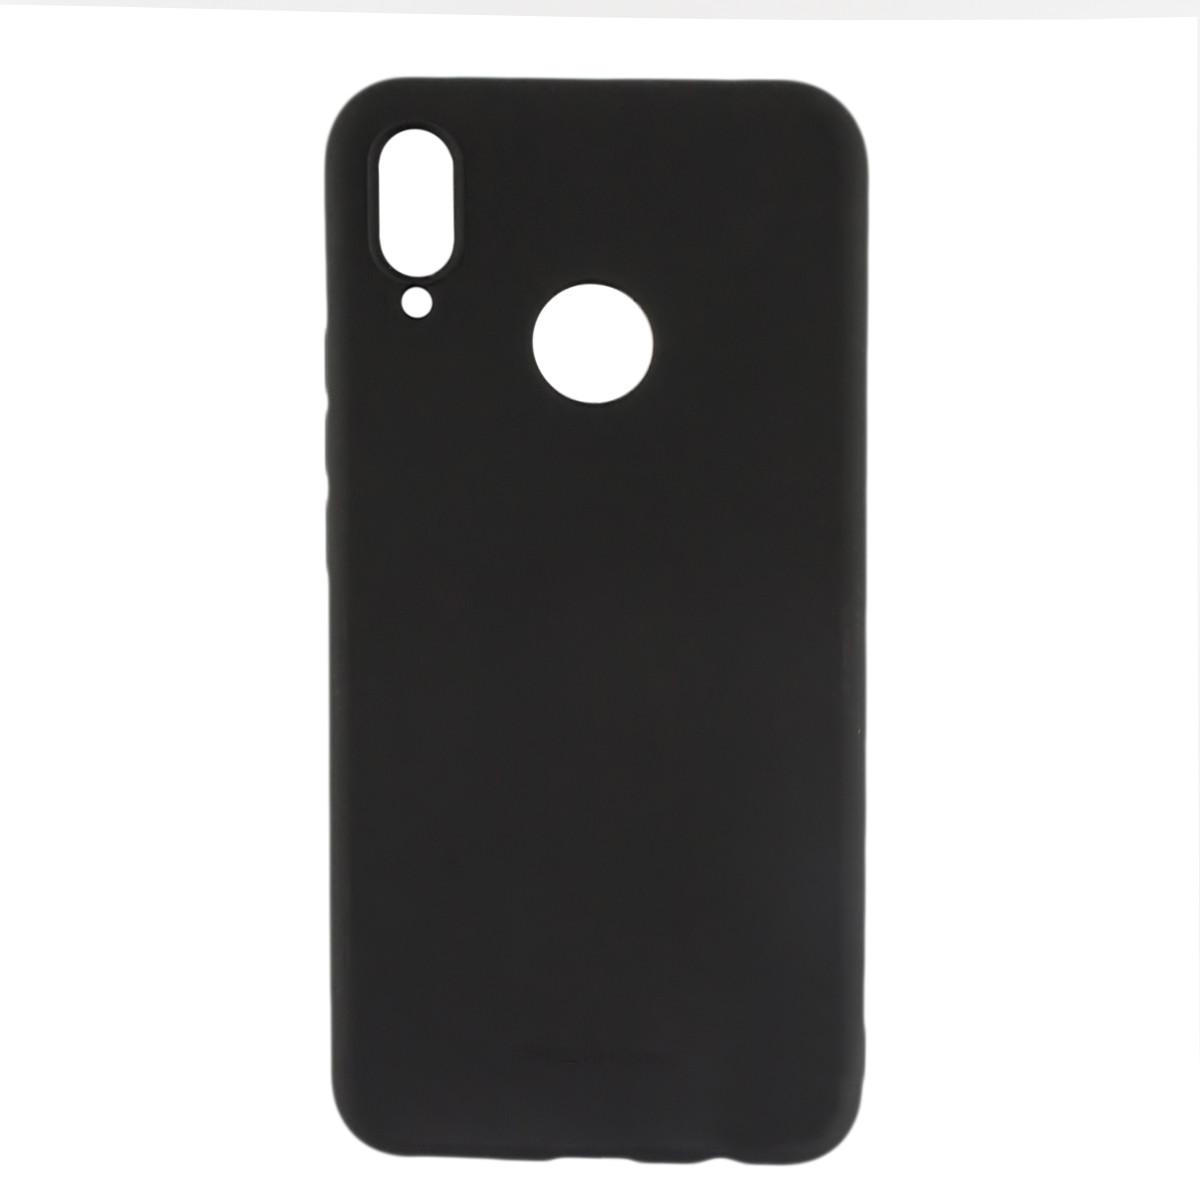 Силиконовый чехол накладка Molan Cano Jelly Case для Huawei P Smart Plus (INE-LX1) (black)